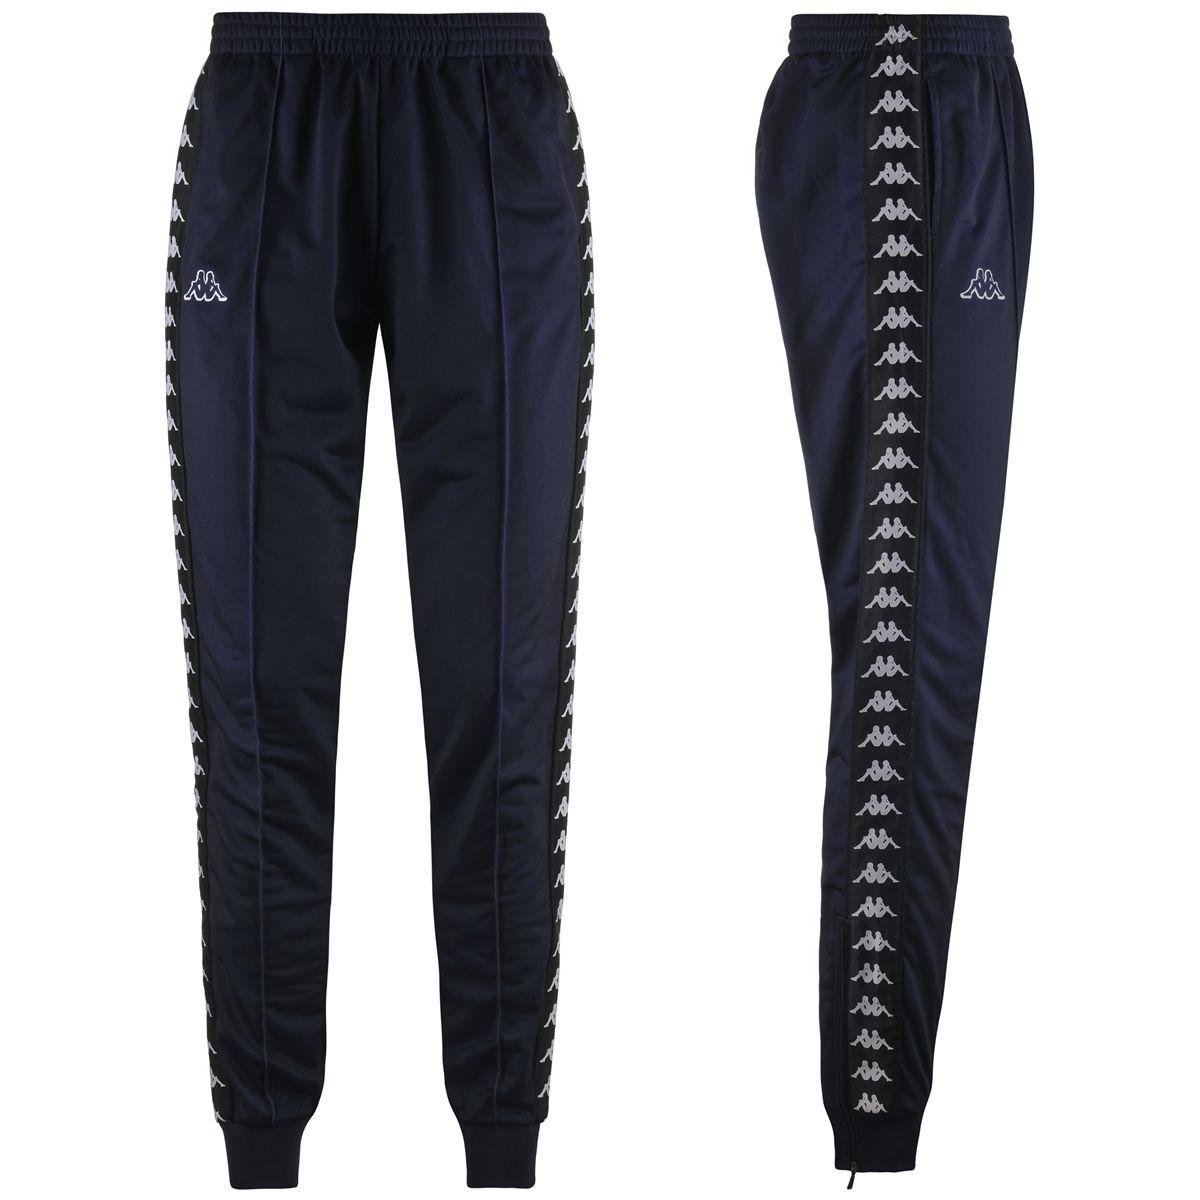 Kappa Pants 222 BANDA ASTORIA RIB SLIM Man Sport Trousers